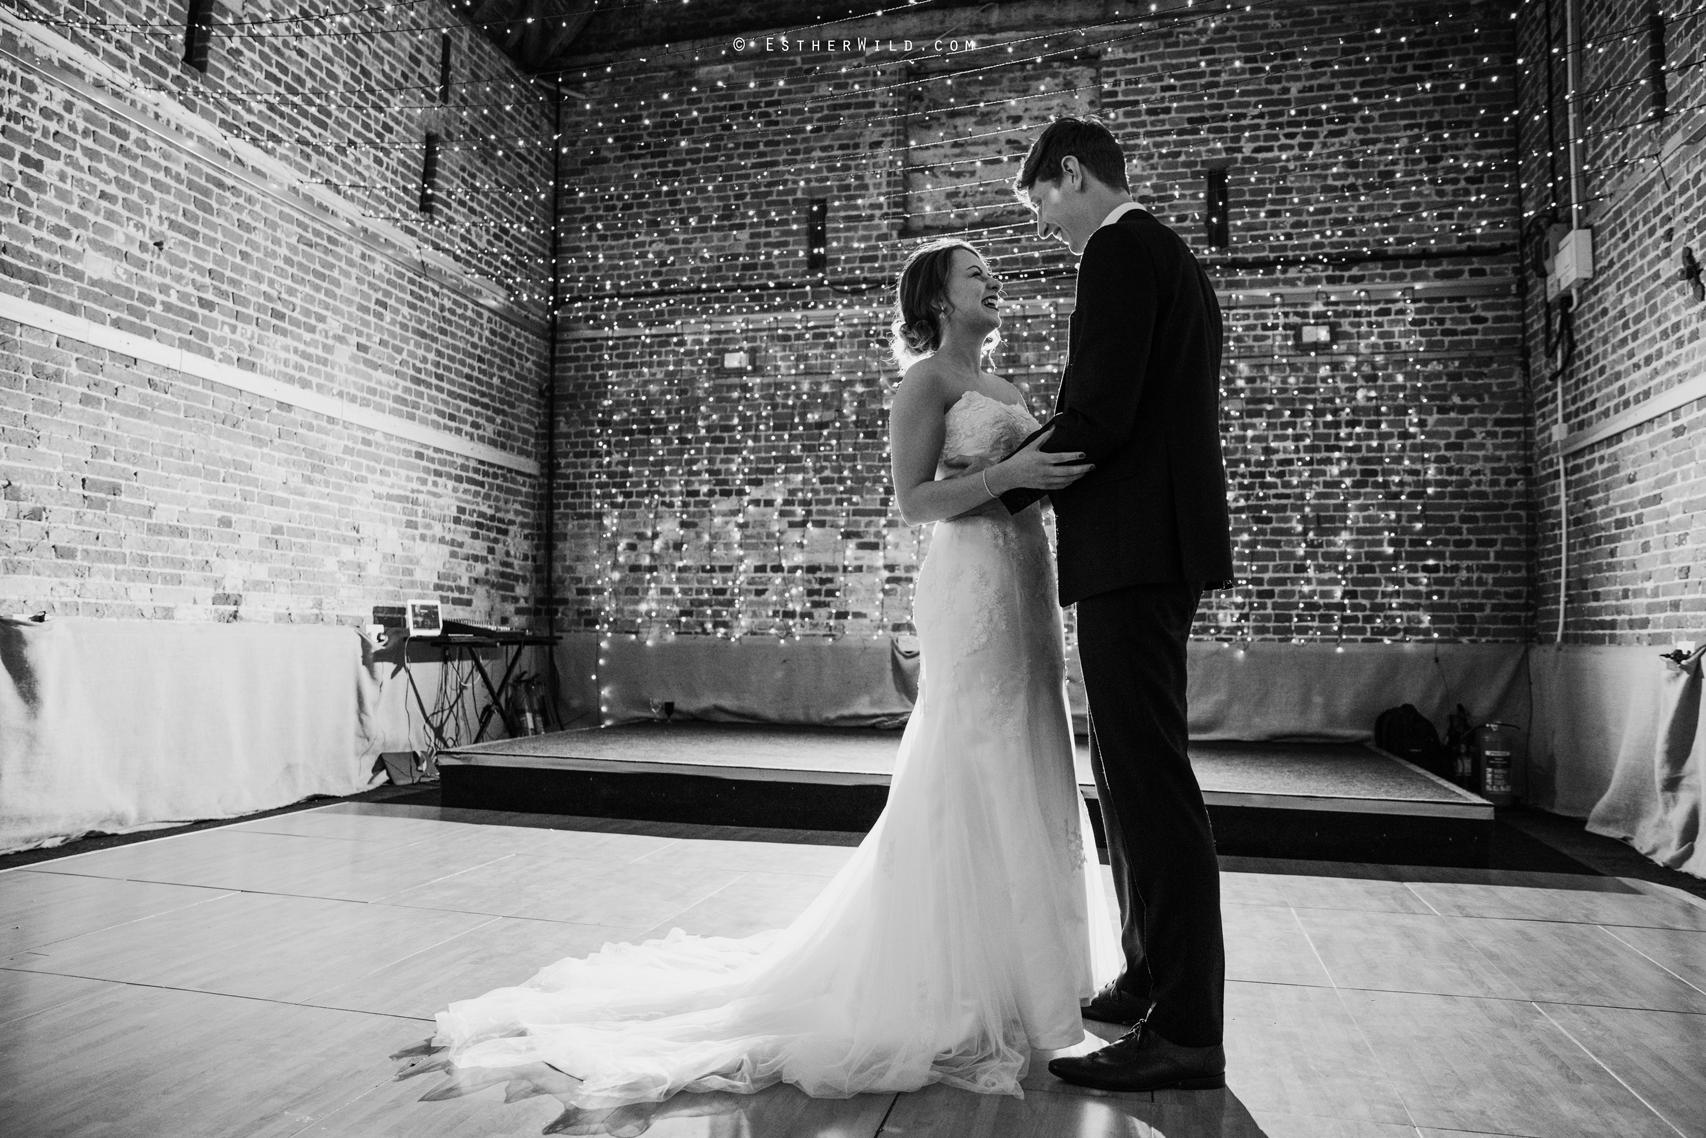 Glebe_Farm_Barn_Rustic_Norfolk_Wedding_Esther_Wild_Photographer_Copyright_IMG_2847-1.jpg